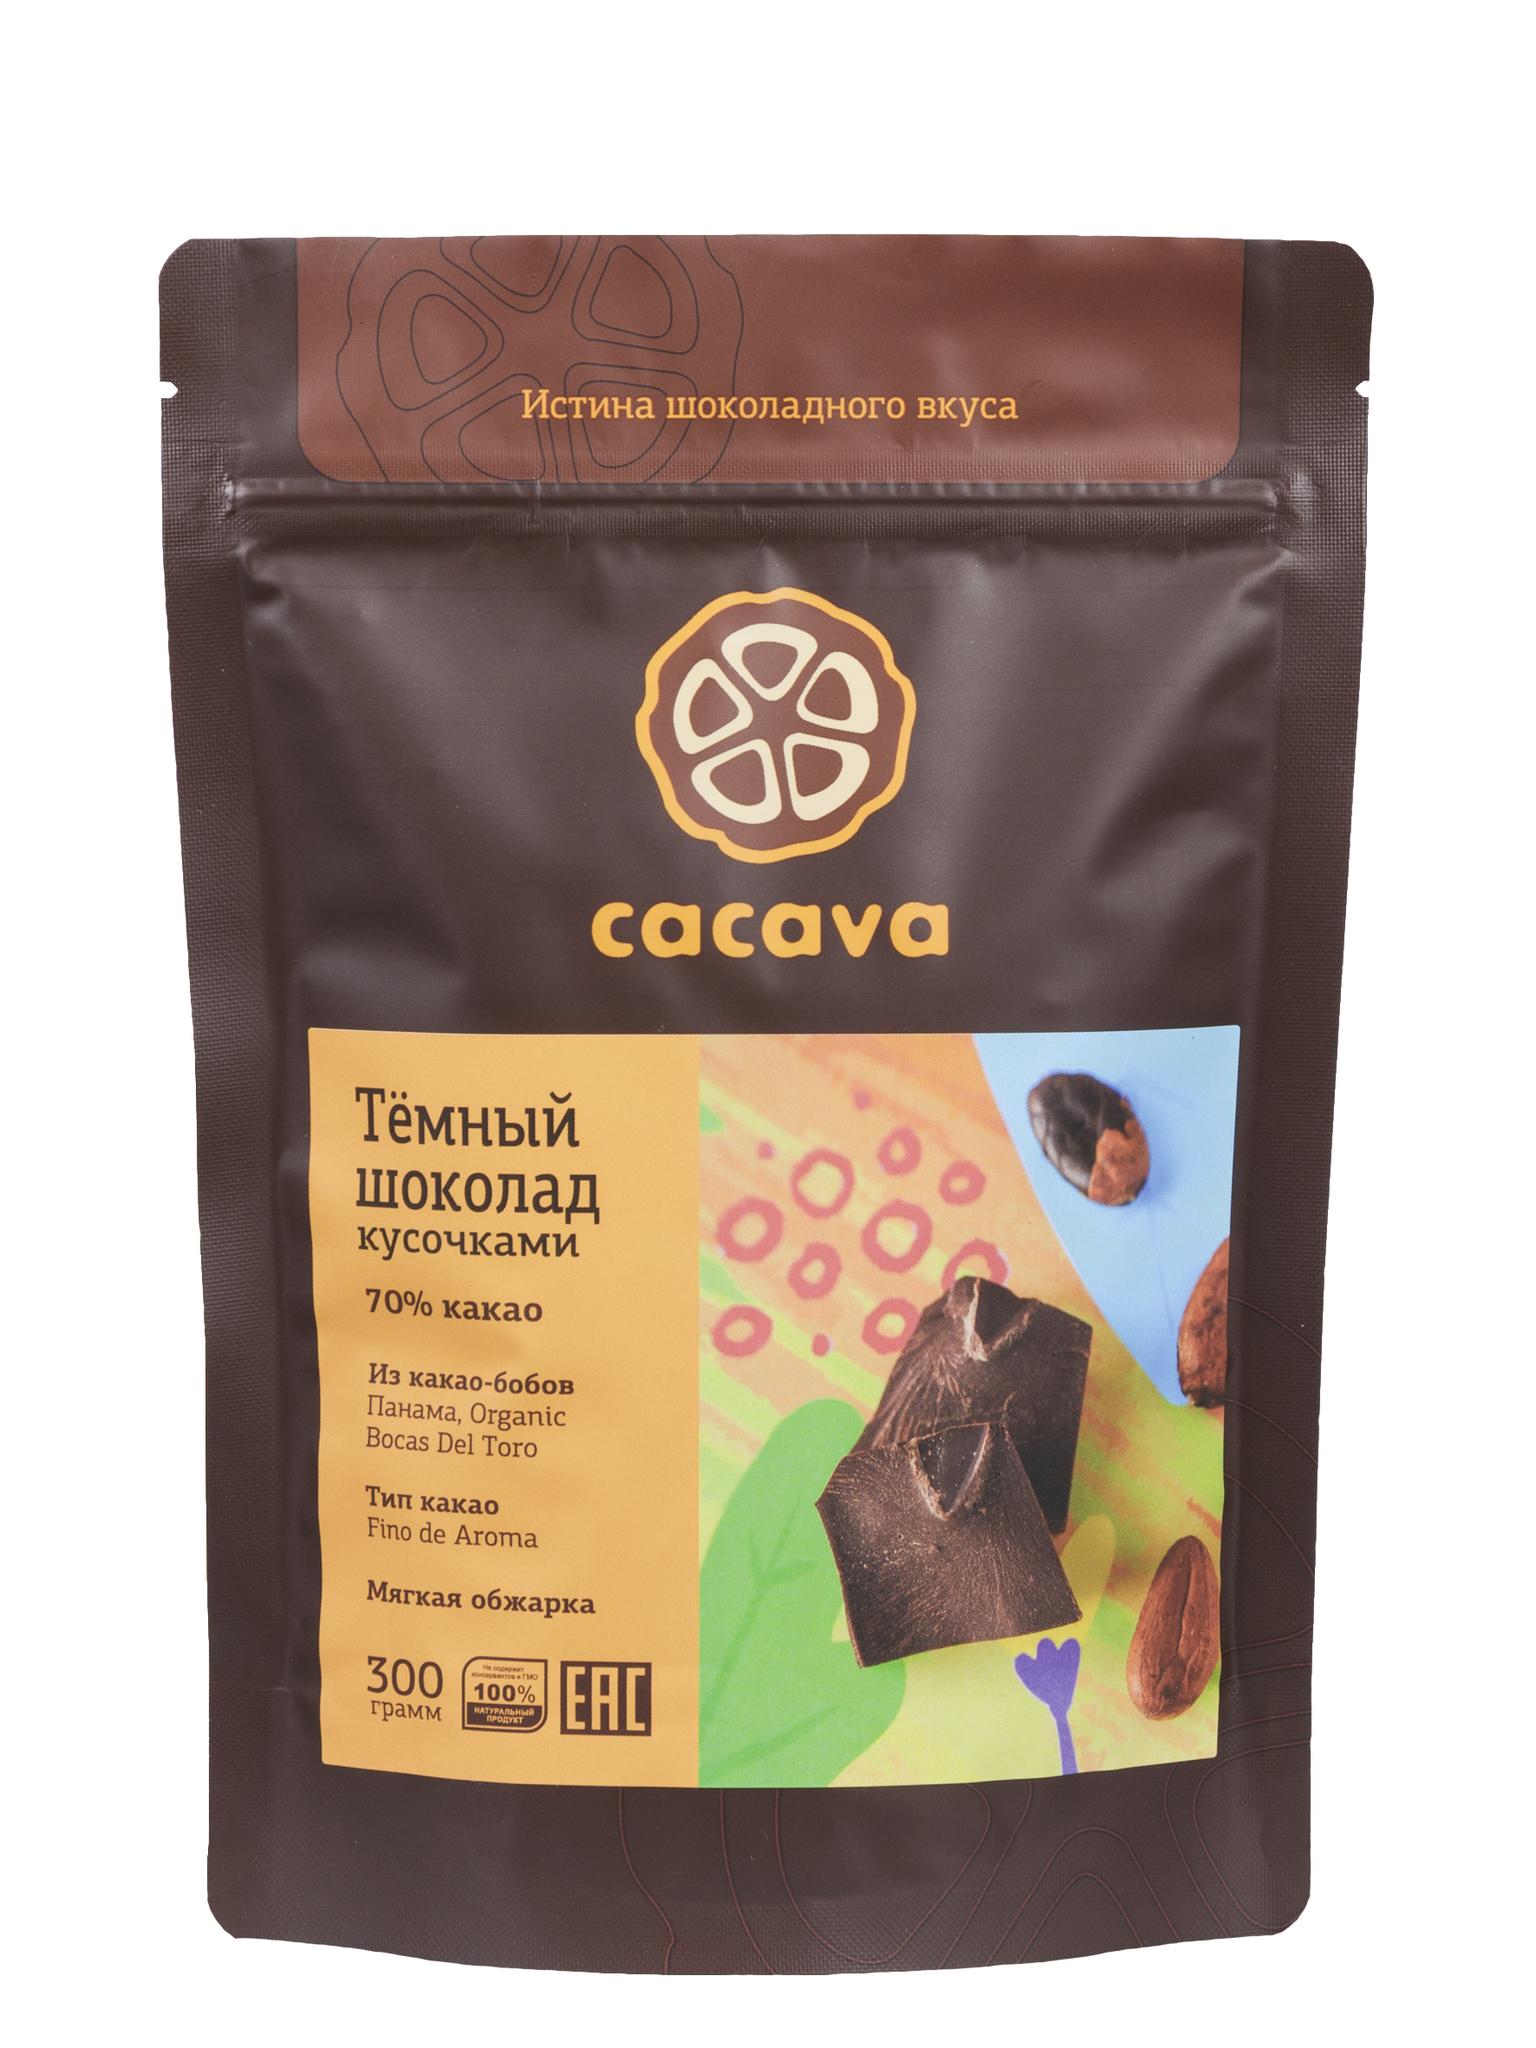 Тёмный шоколад 70 % какао (Панама), упаковка 300 грамм